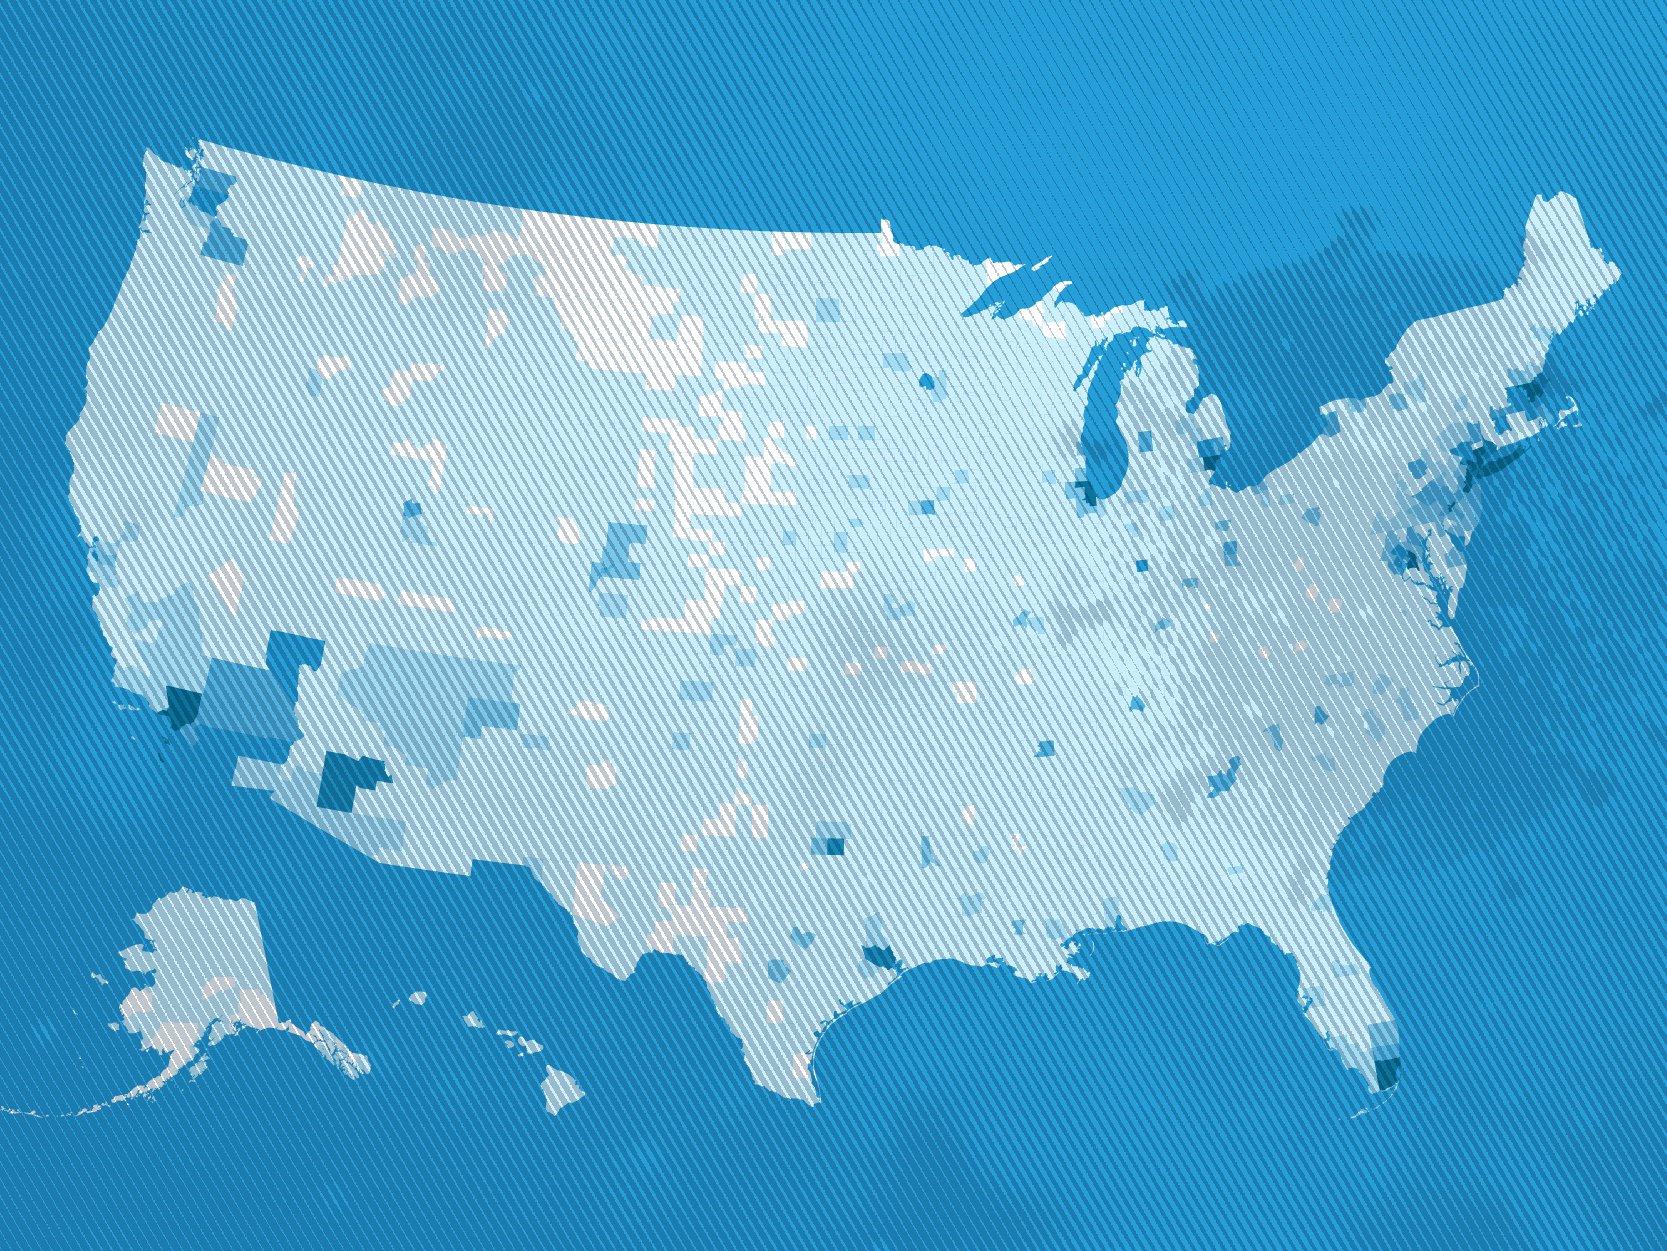 US Coronavirus Spread Map